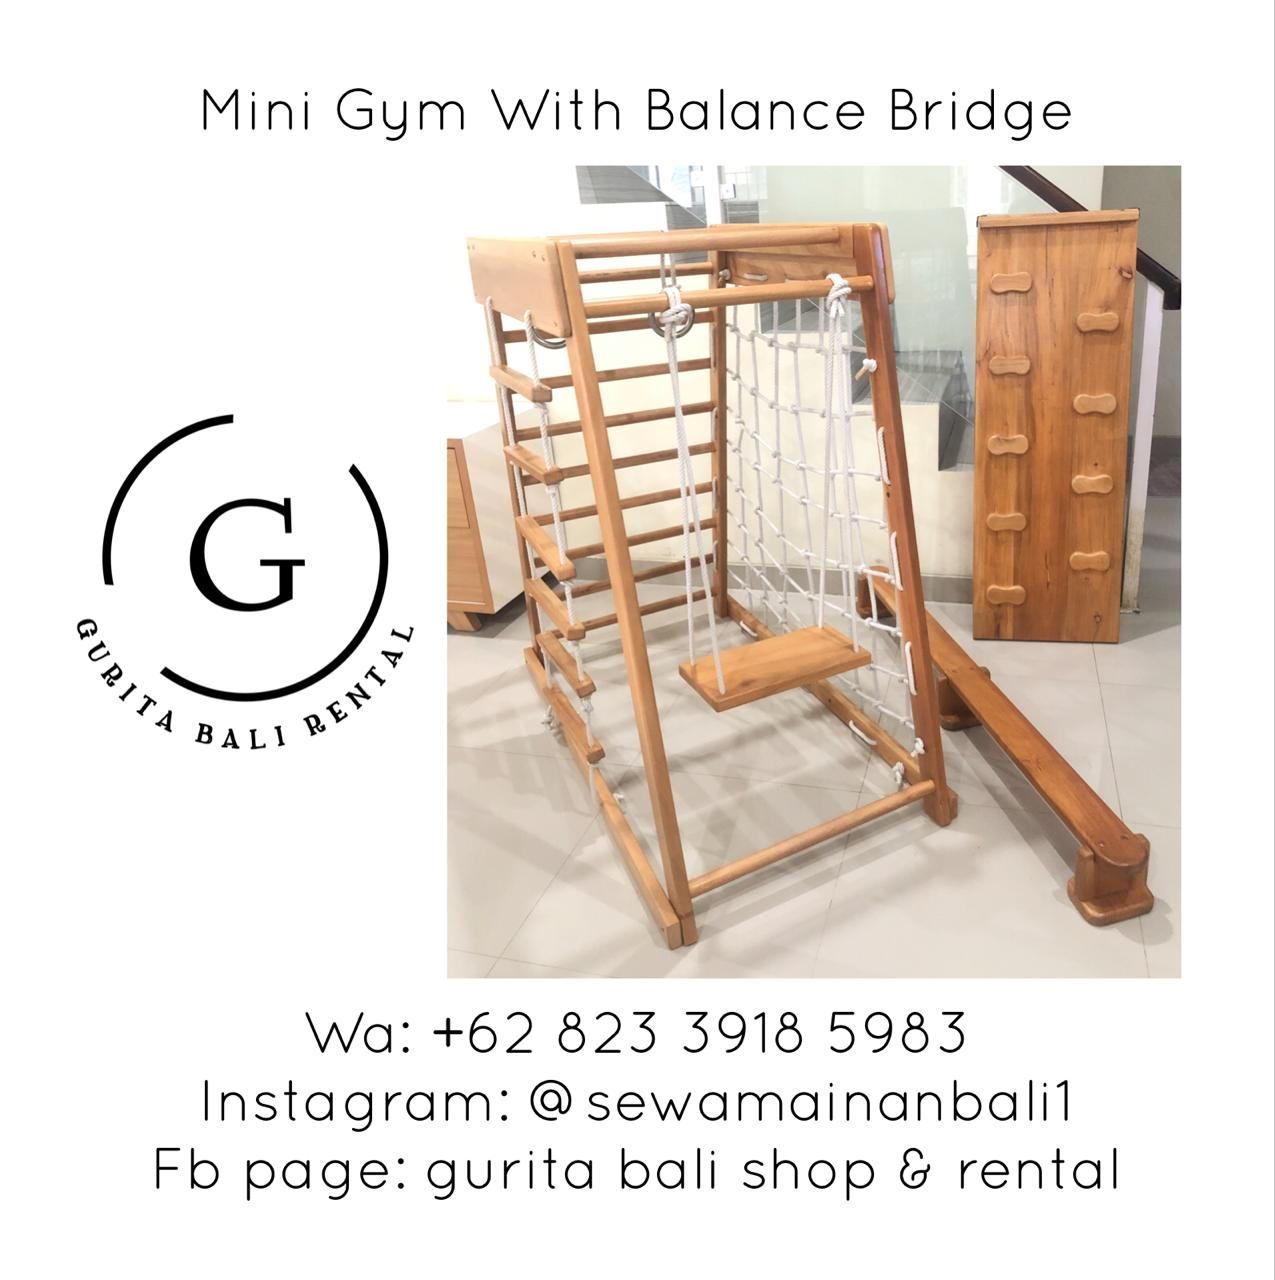 MINI GYM WITH BALANCE BRIDGE 3